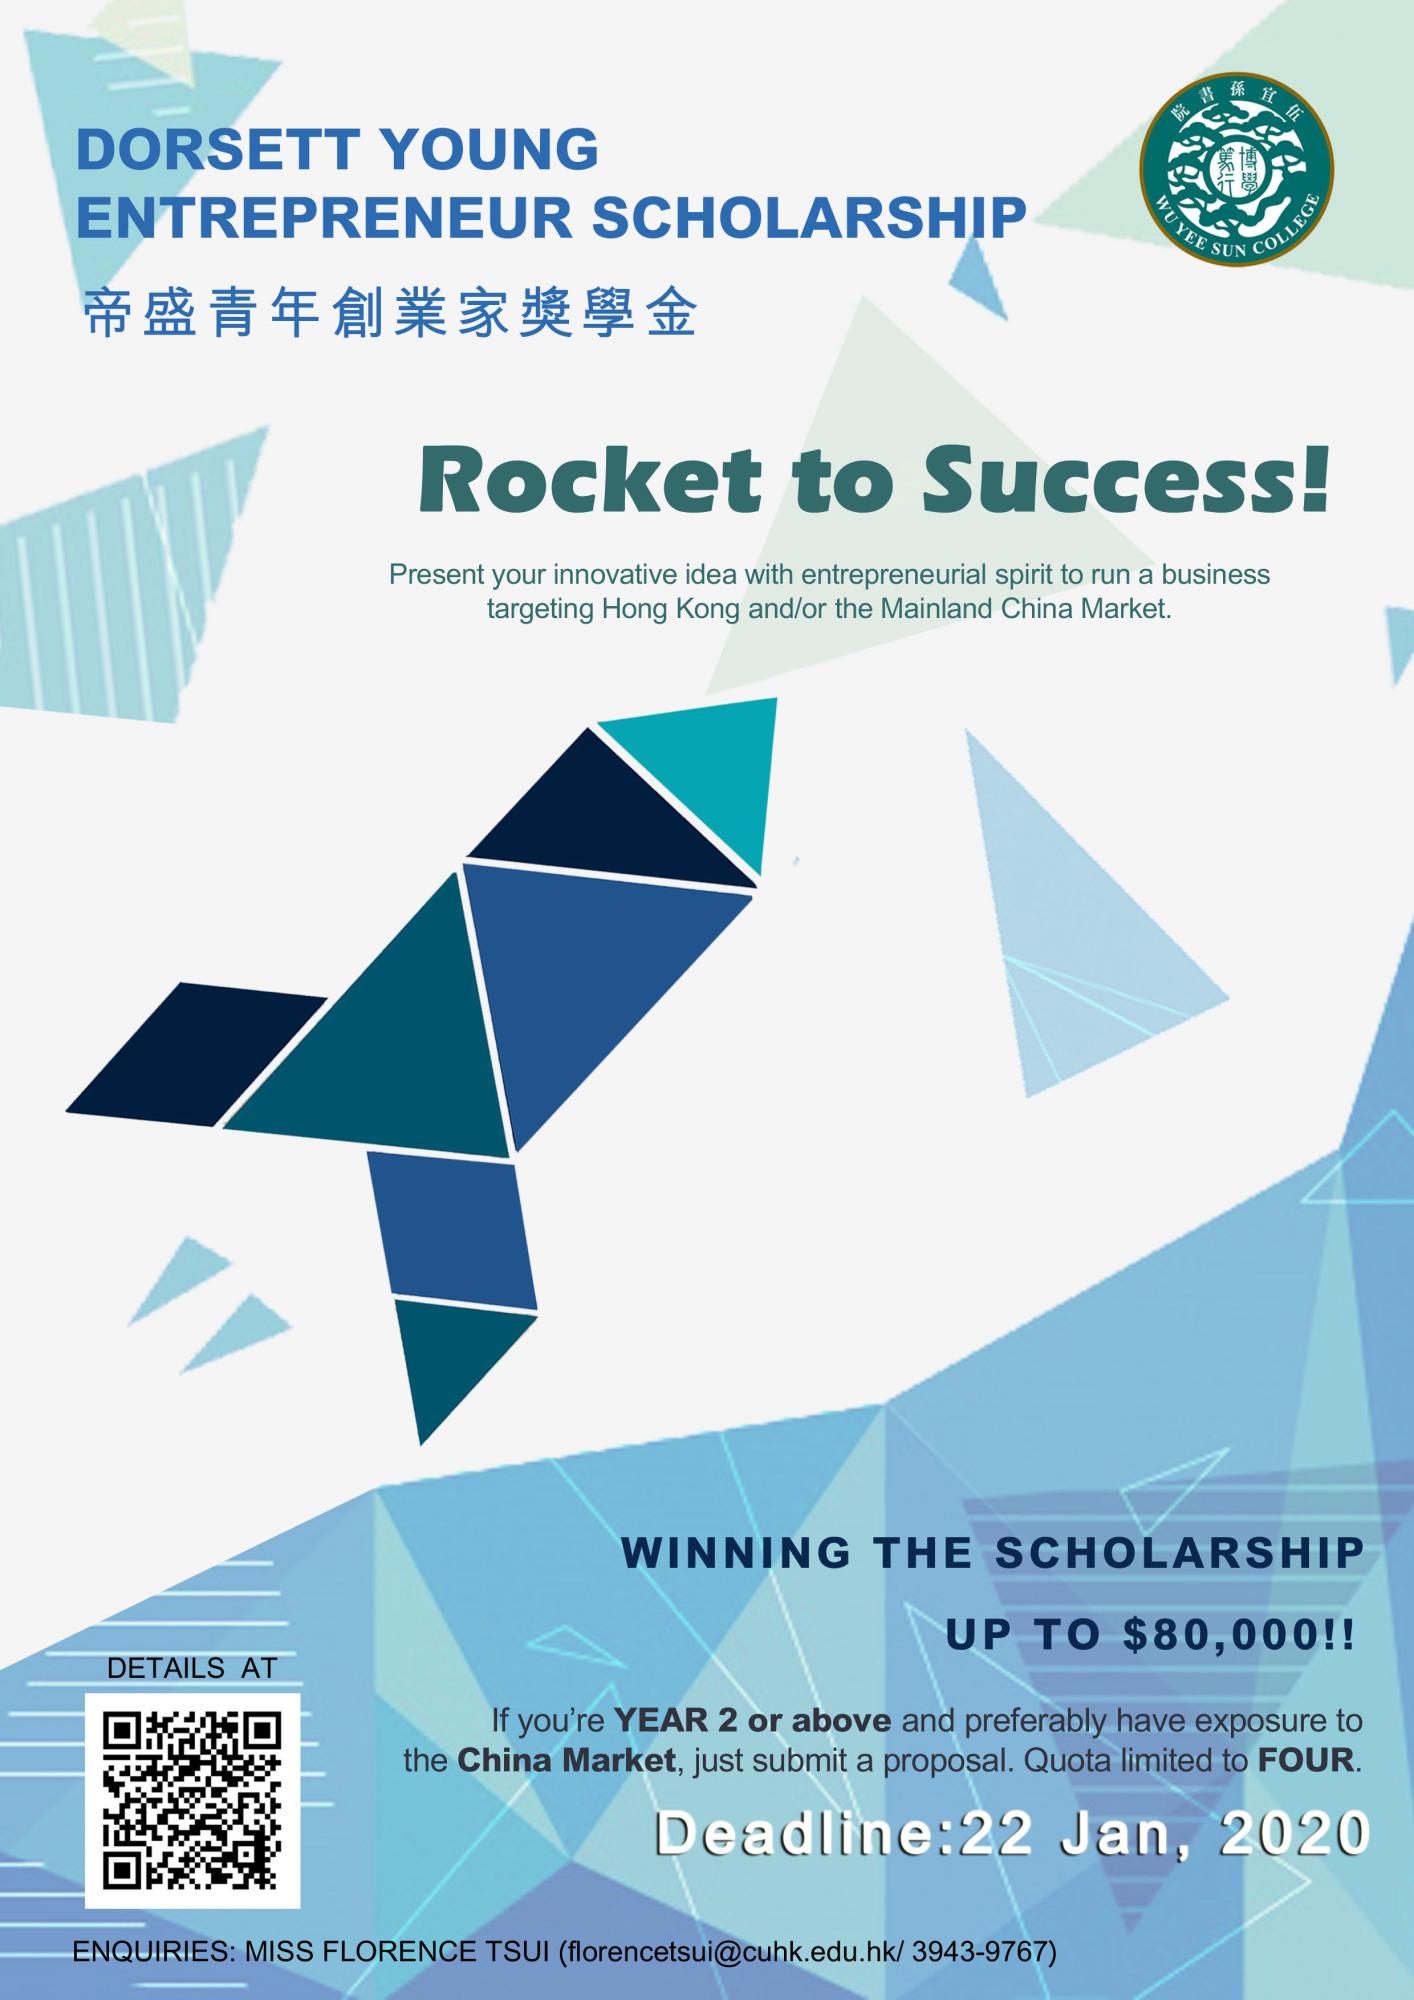 Dorsett_Young_Entrepreneur_Scholarship.png